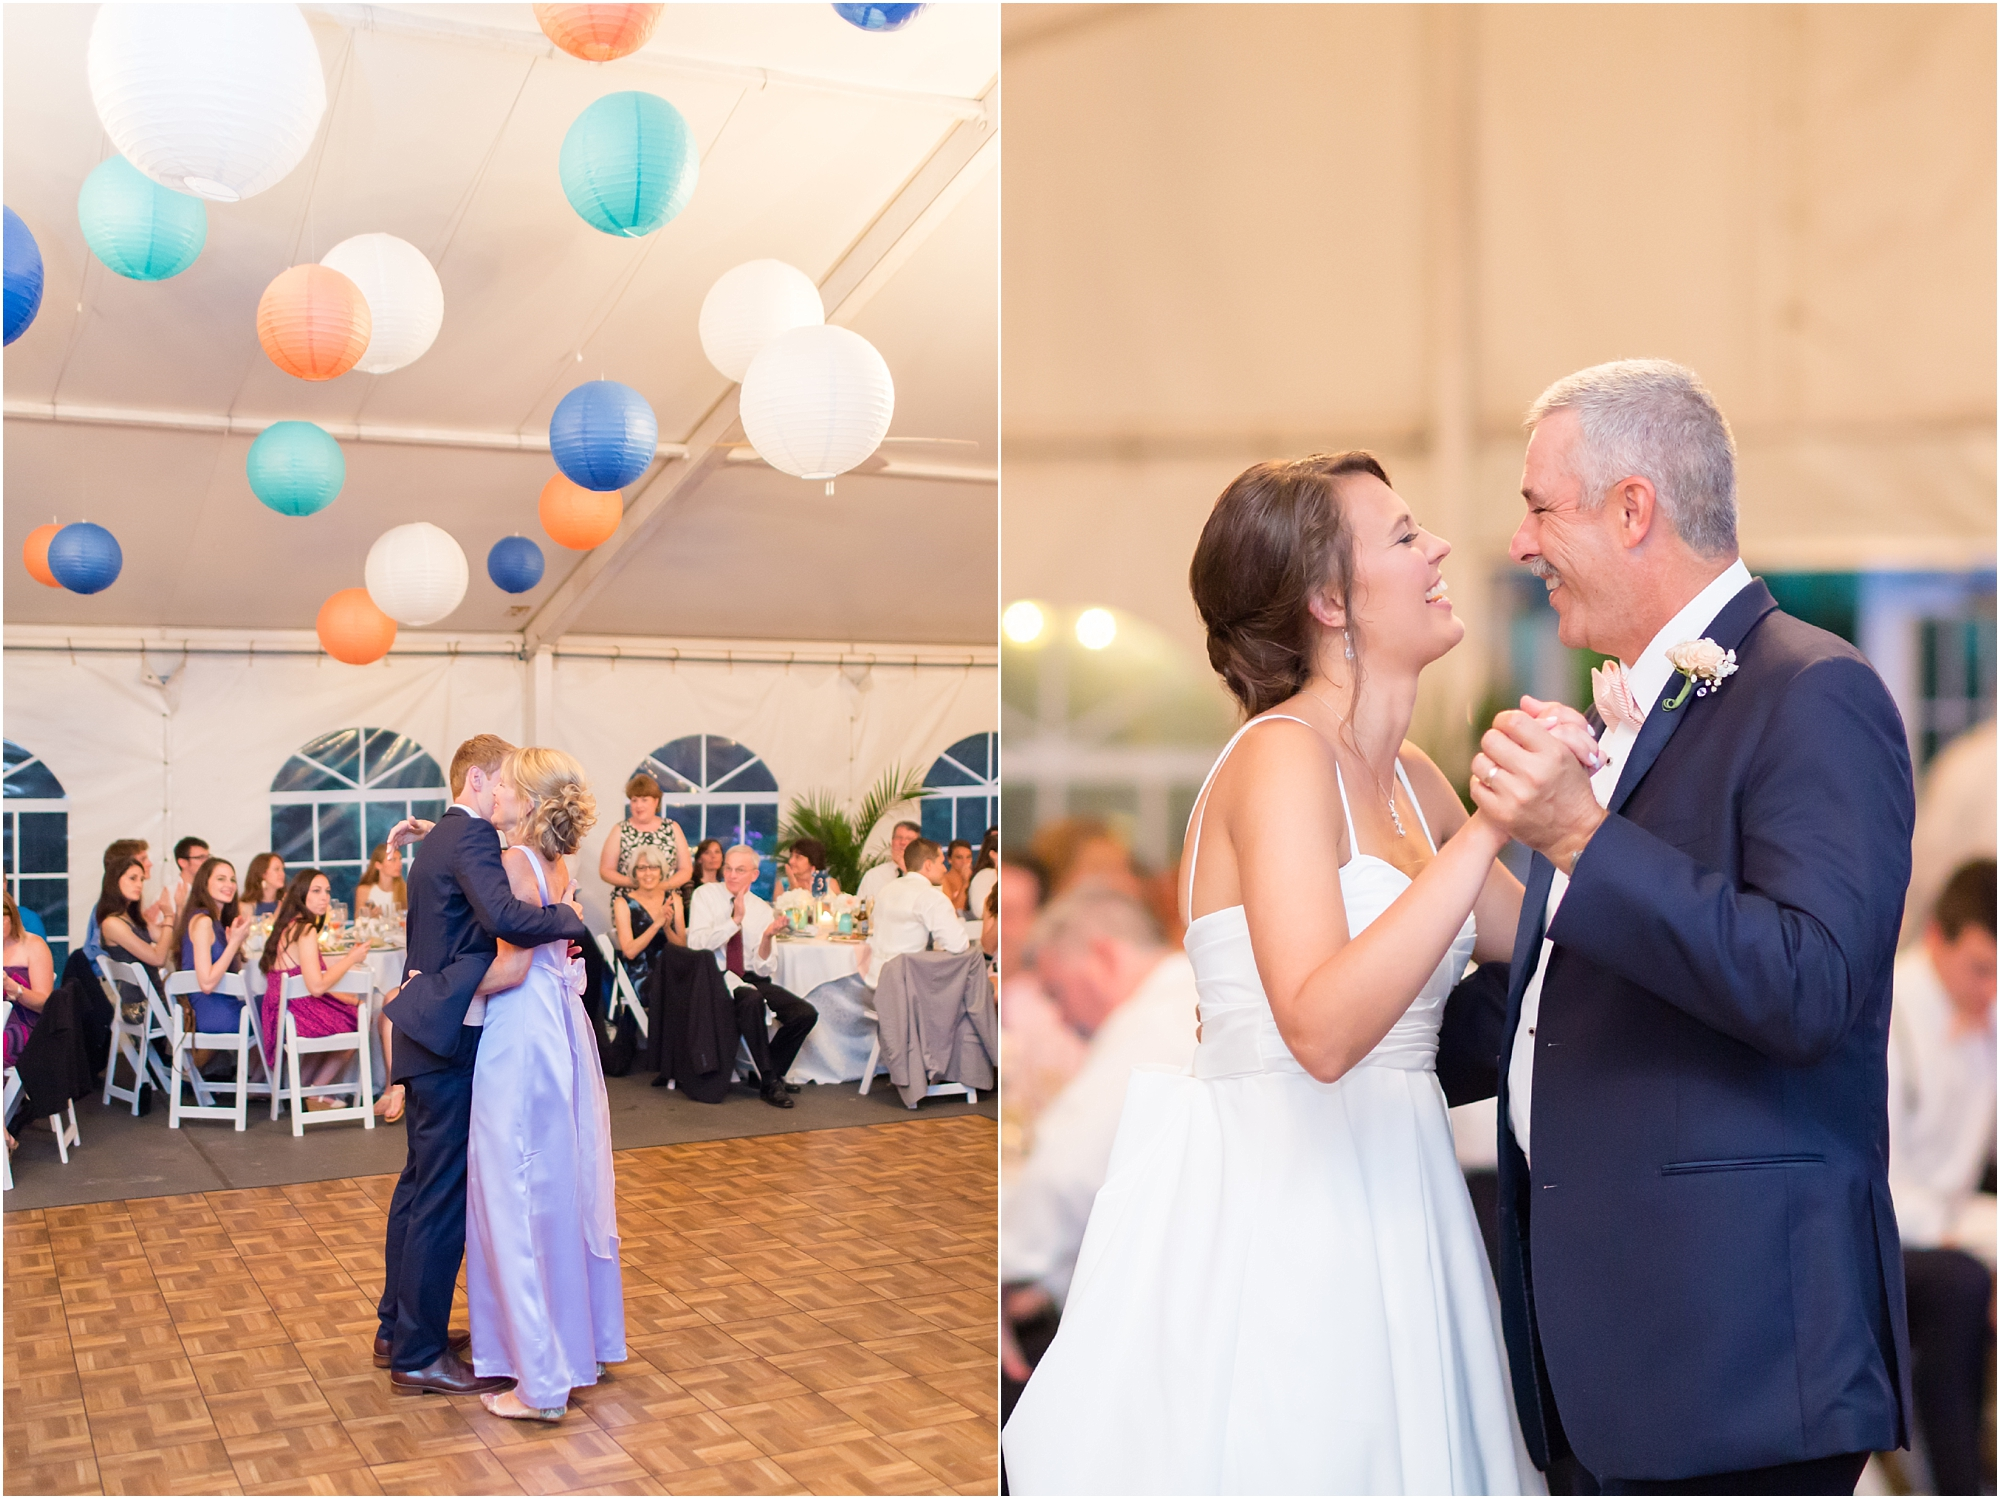 Russell 6-Reception-1101_anna grace photography baltimore maryland wedding photographer elkridge furnace inn wedding photo.jpg